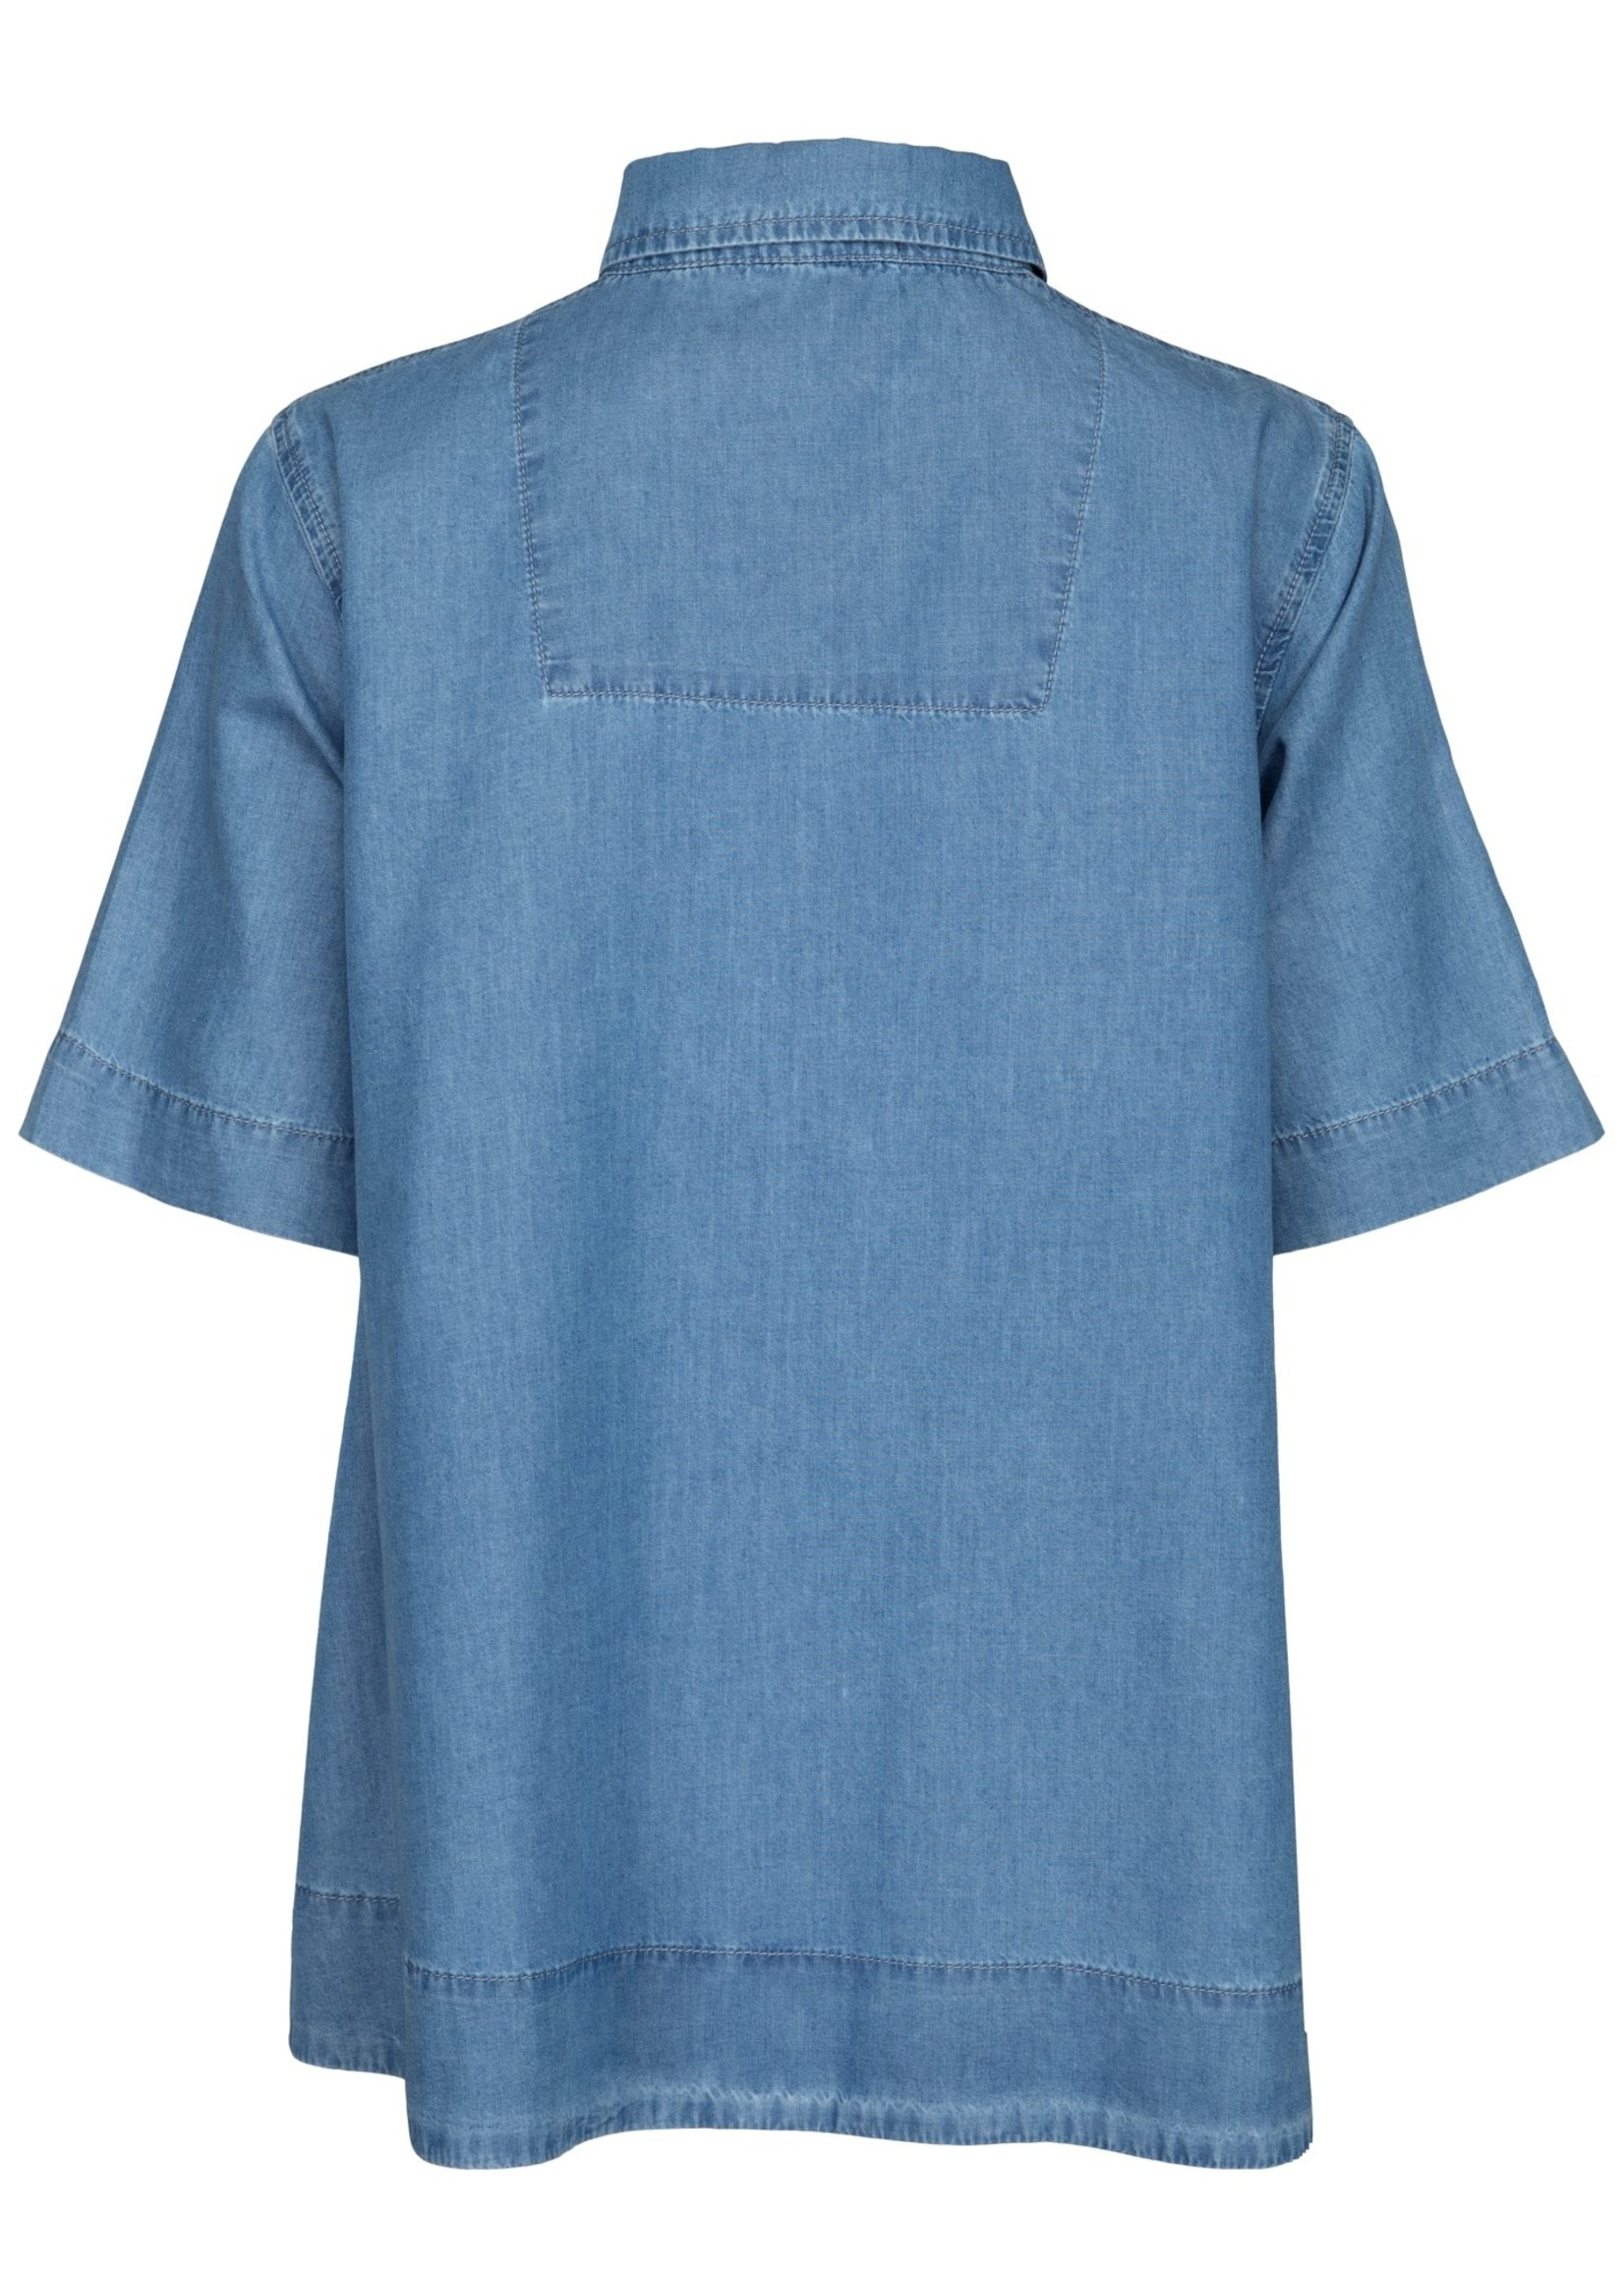 TWO DANES 37544 367 Darcey Cotton Tencel Shirt